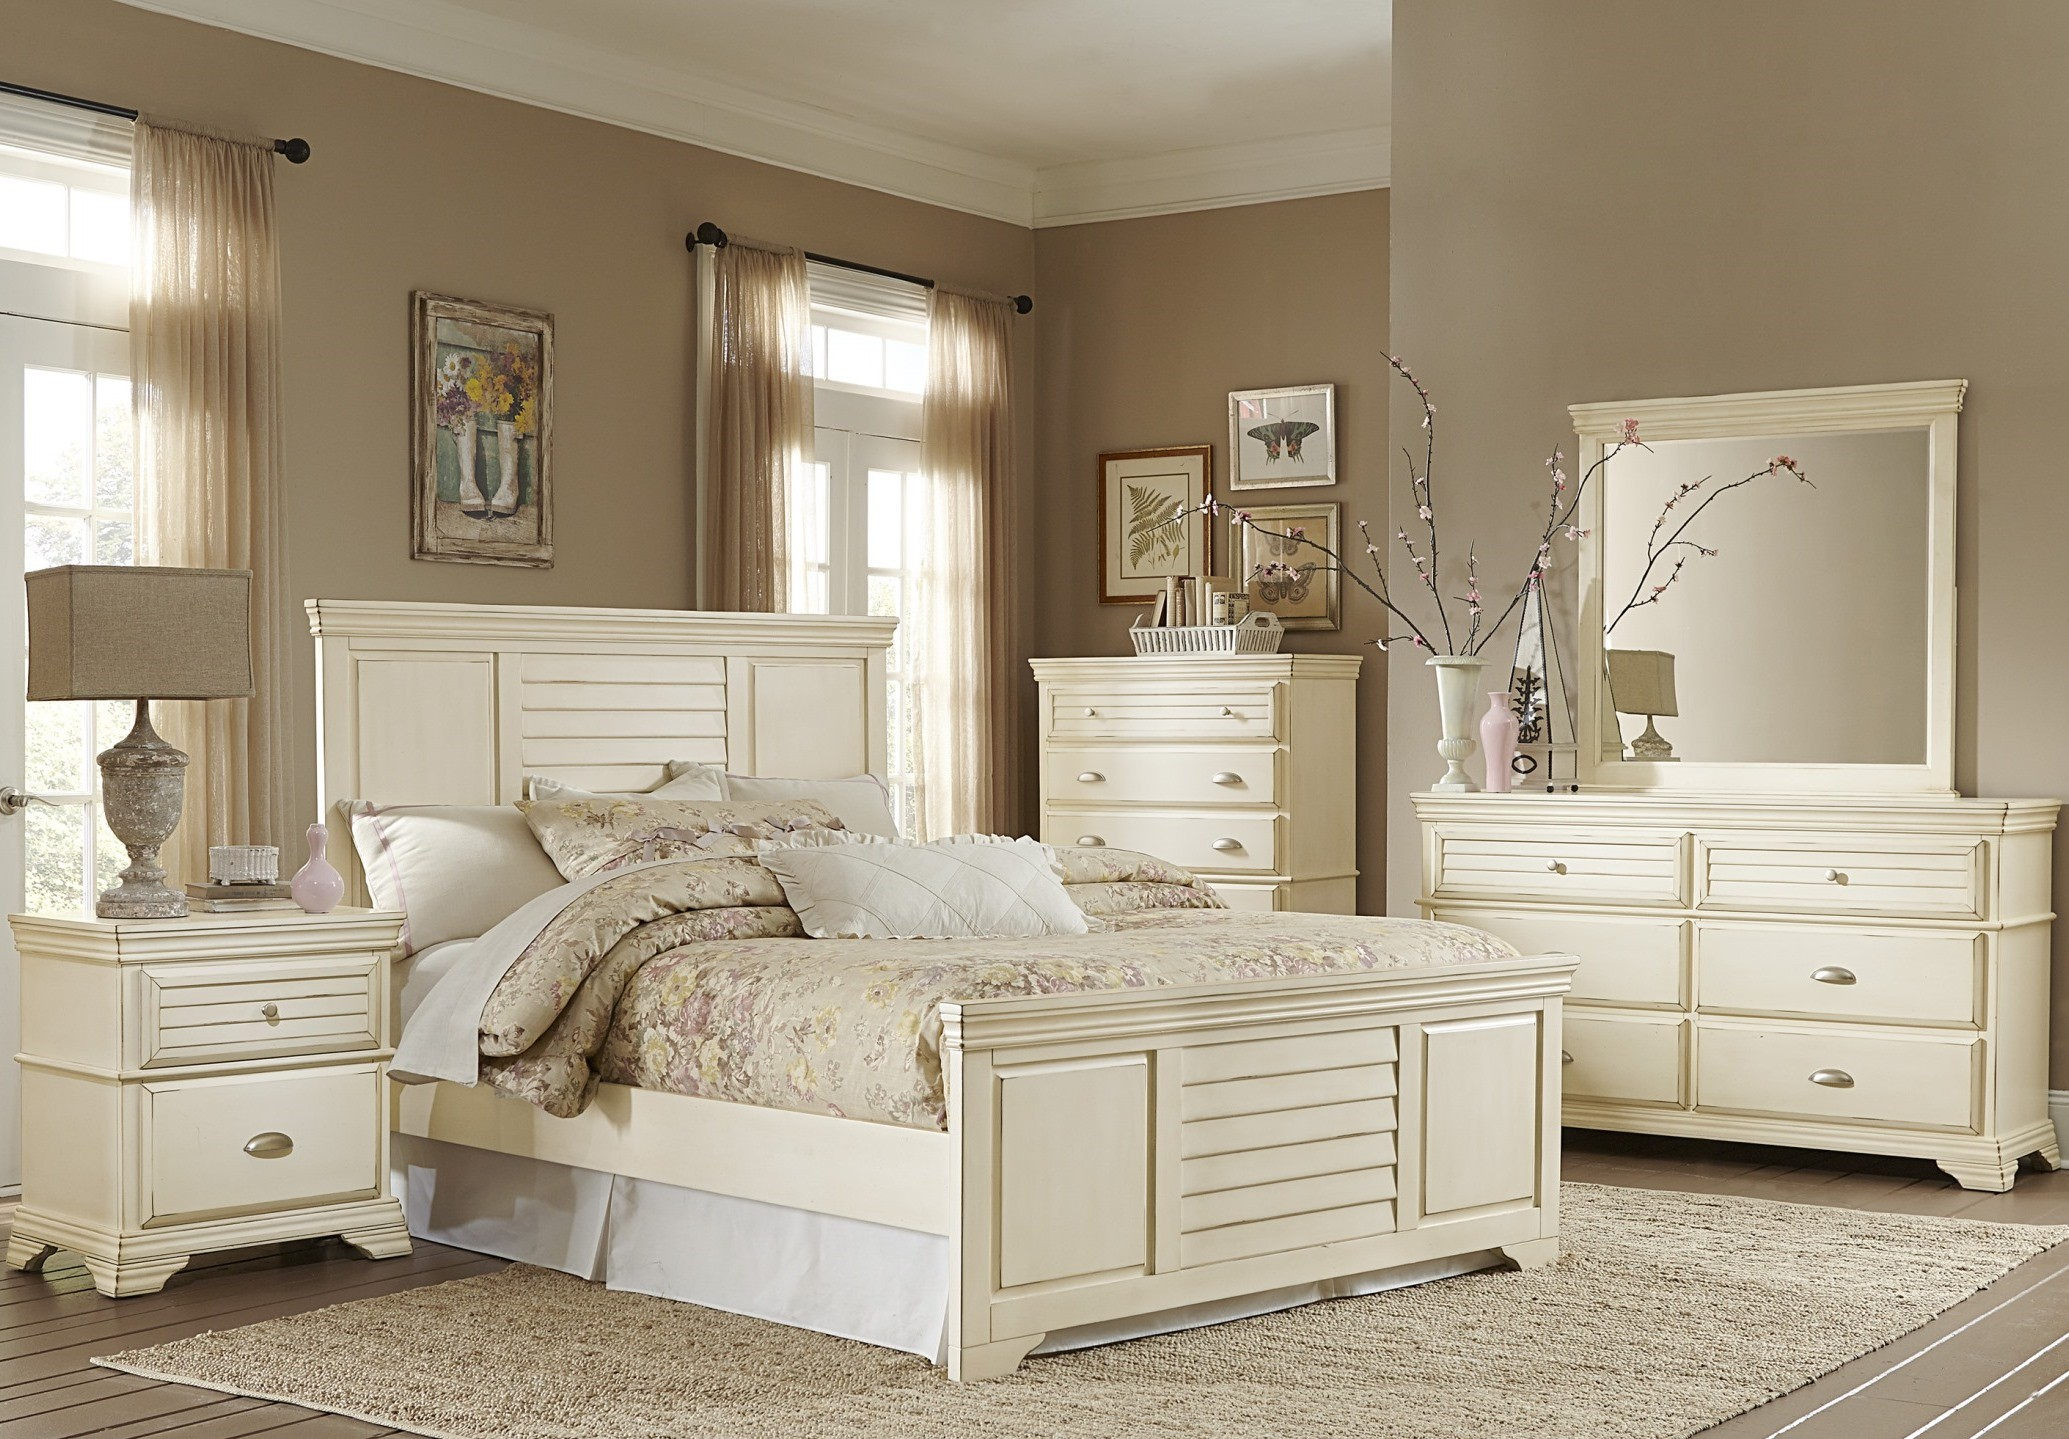 Laurinda Antique White Panel Bedroom Set From Homelegance 1846 1 Coleman Furniture